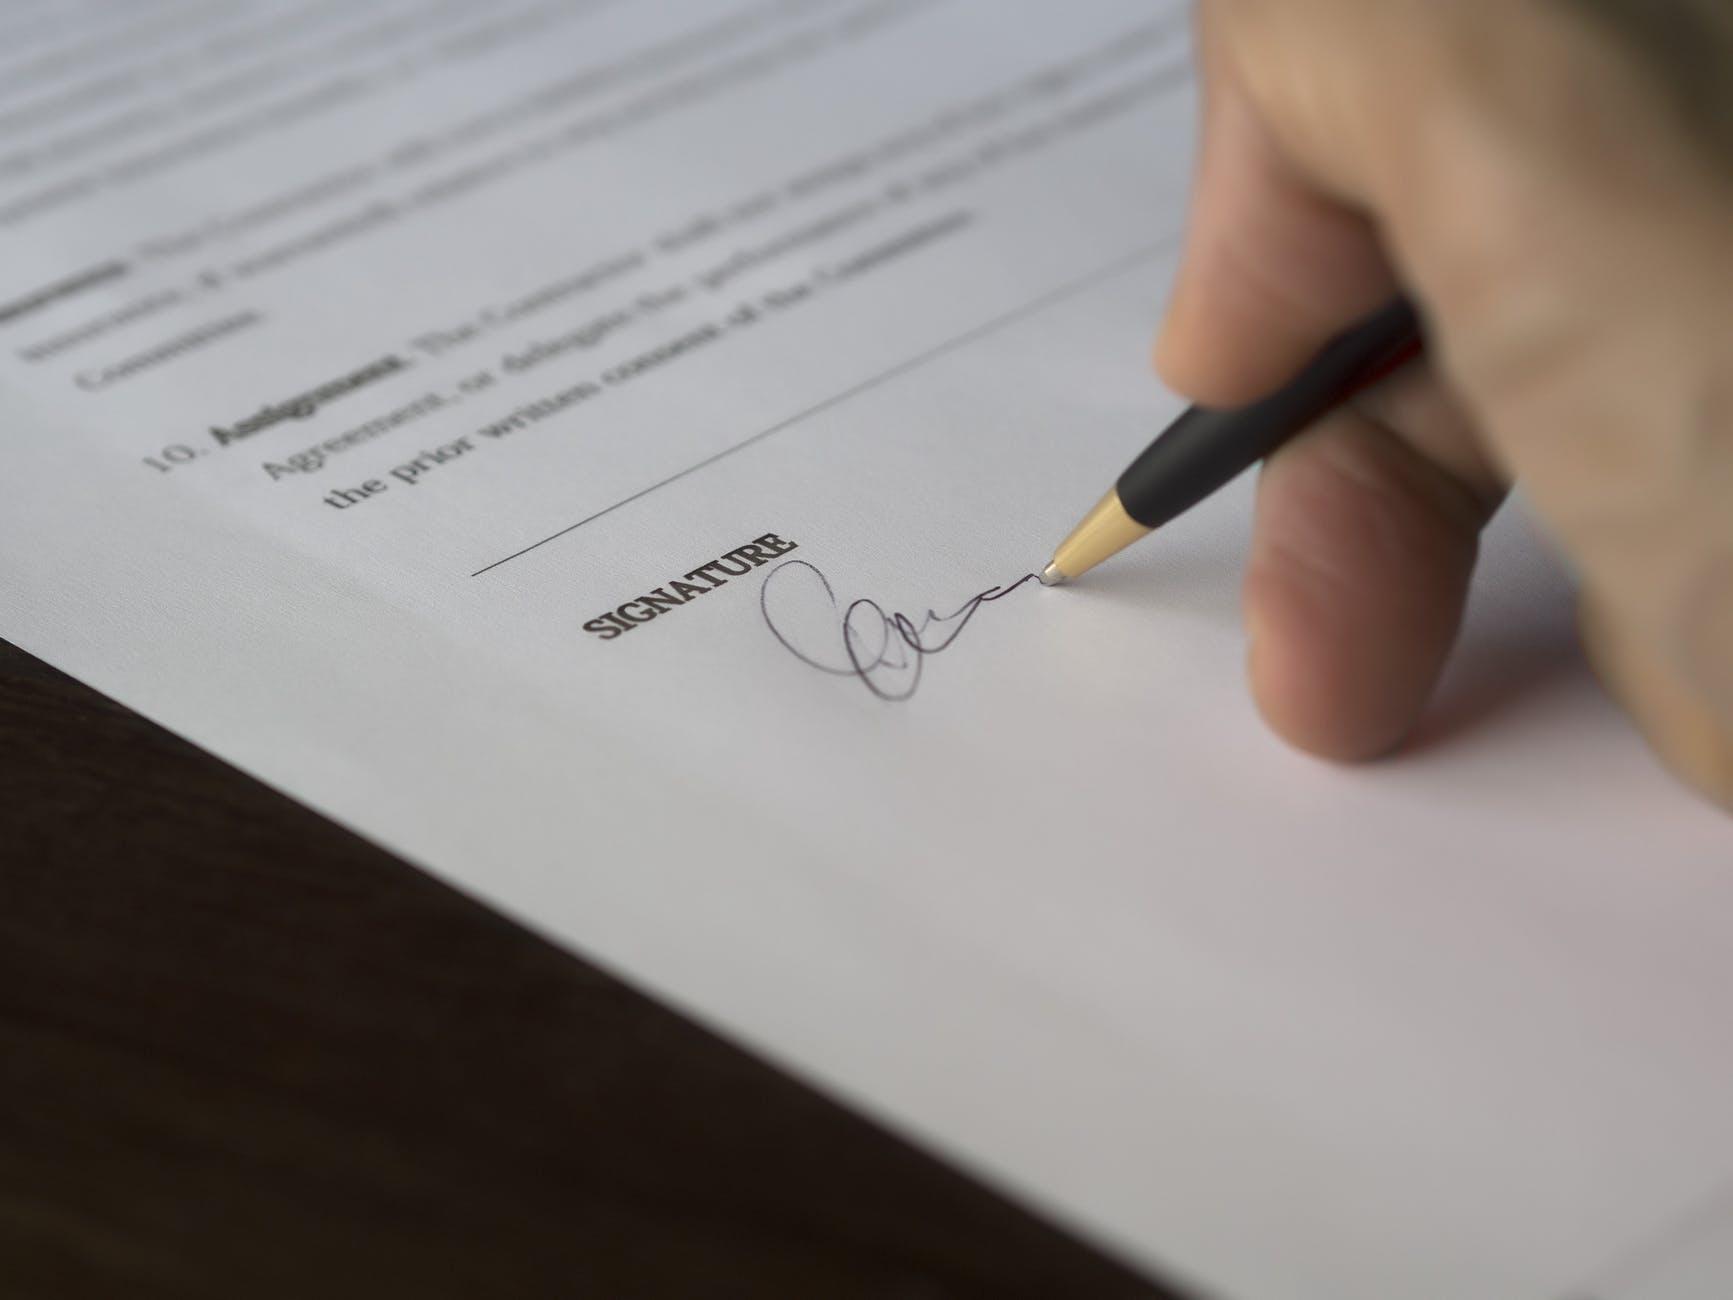 Ruptures du contrat de travail